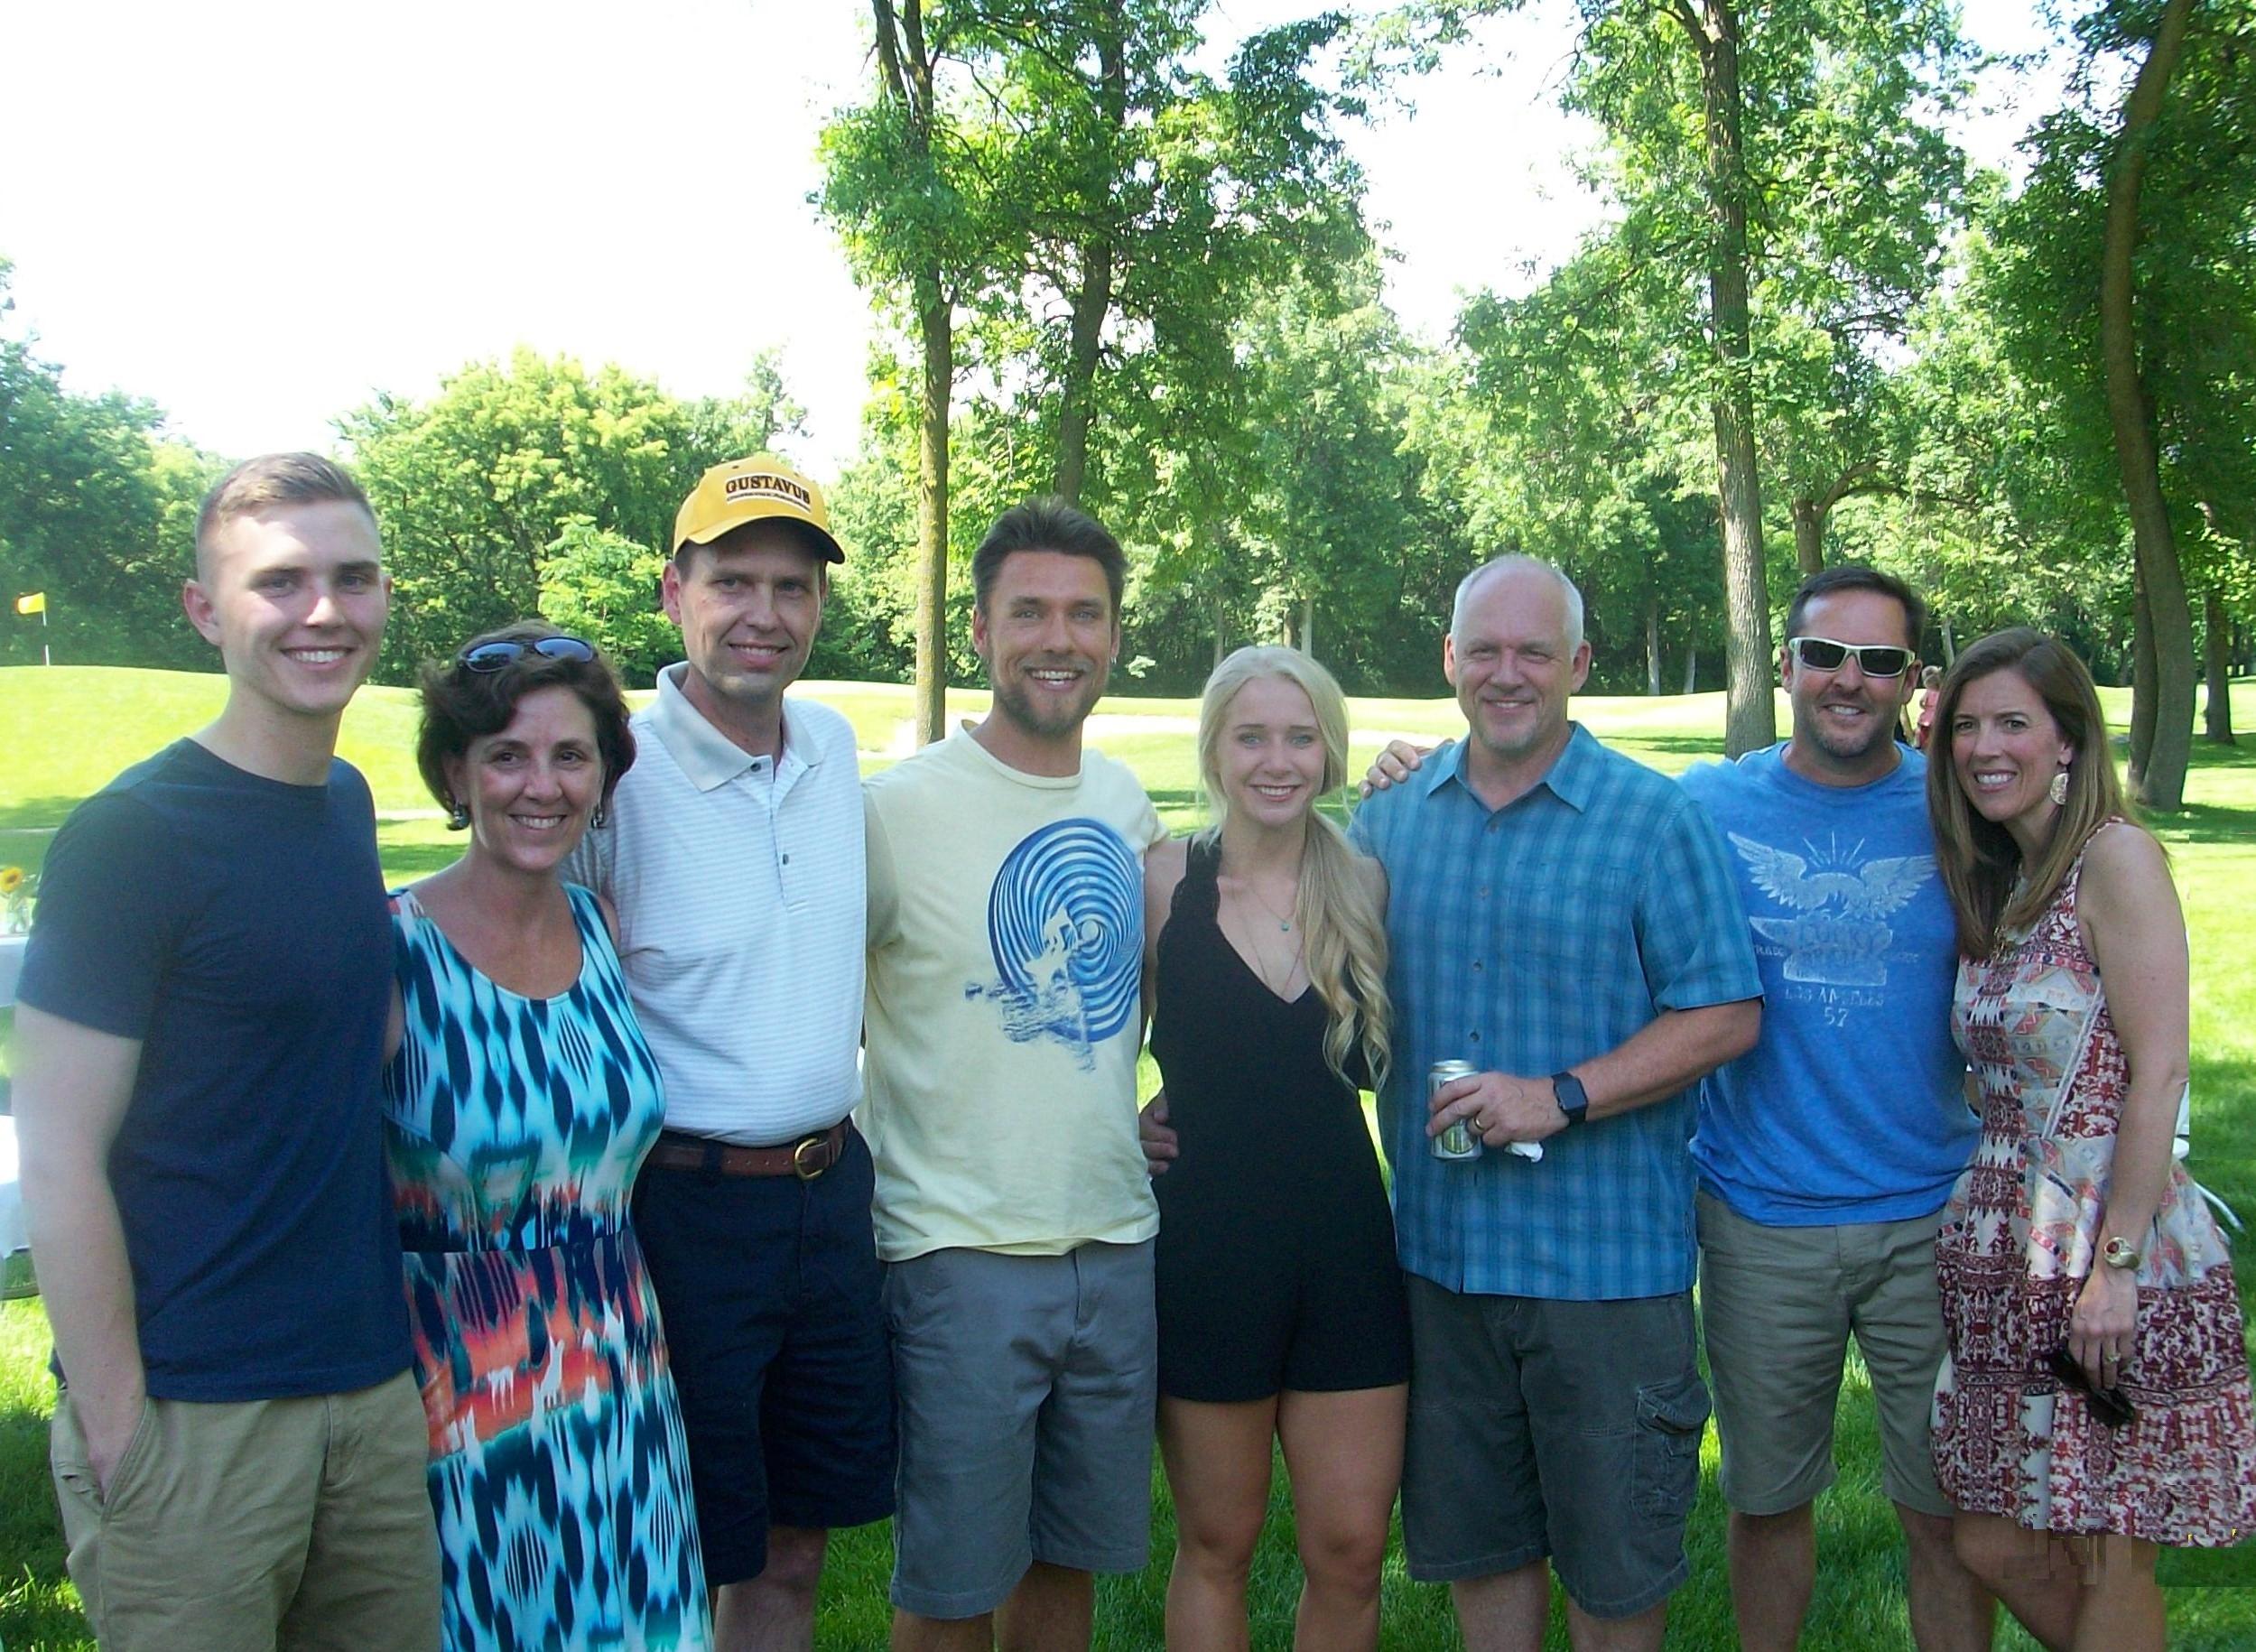 Lydia Brekke Champlin Park High School Graduation Party 6/11/16